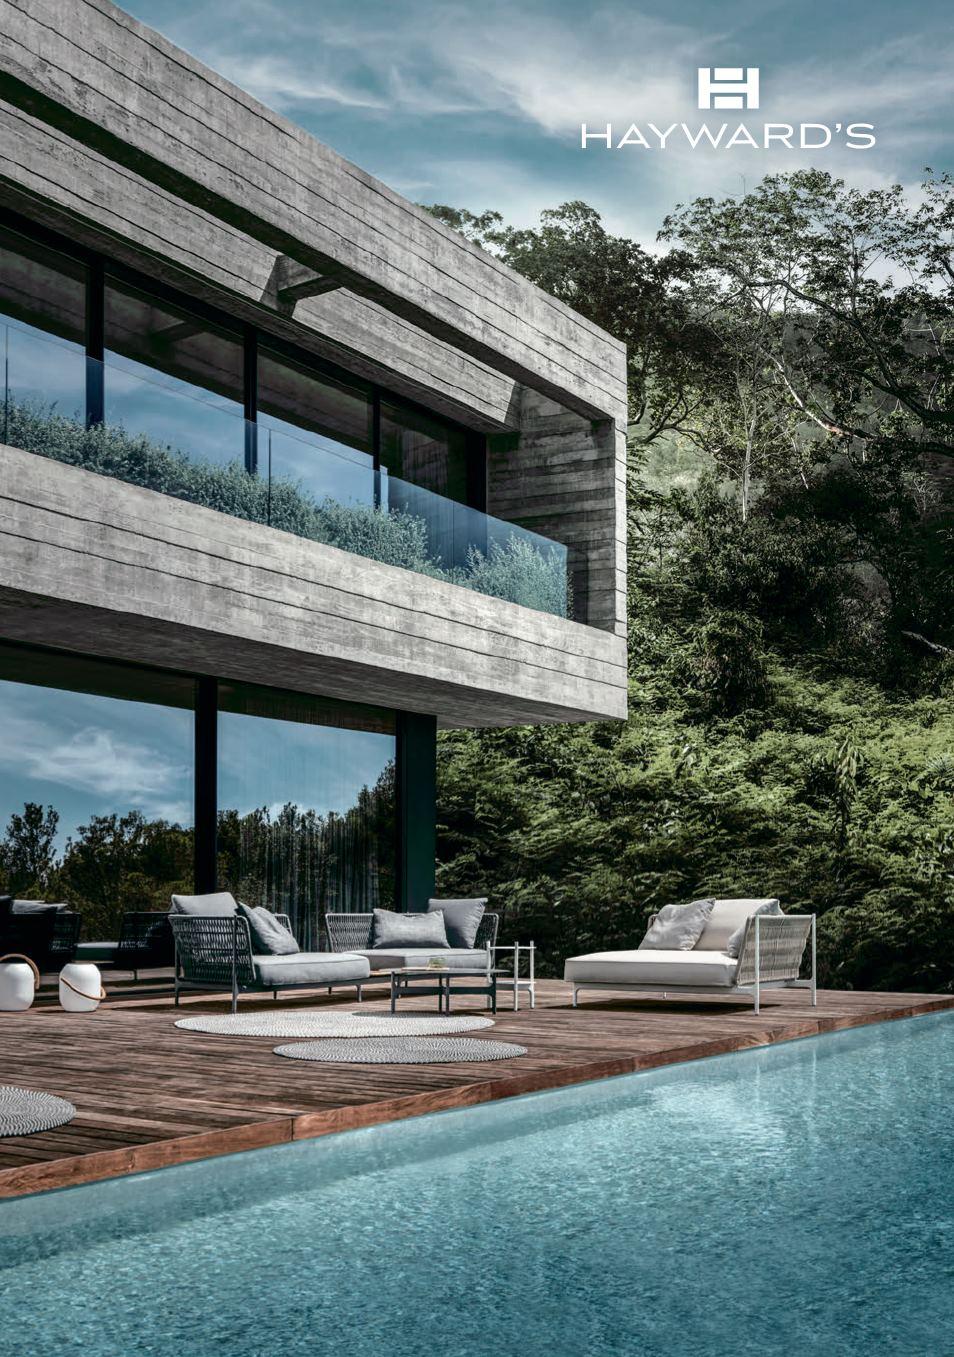 Haywards Patio Furniture Santa Barbara. Of Outdoor Furniture And  Accessories Between Los Angeles San Francisco